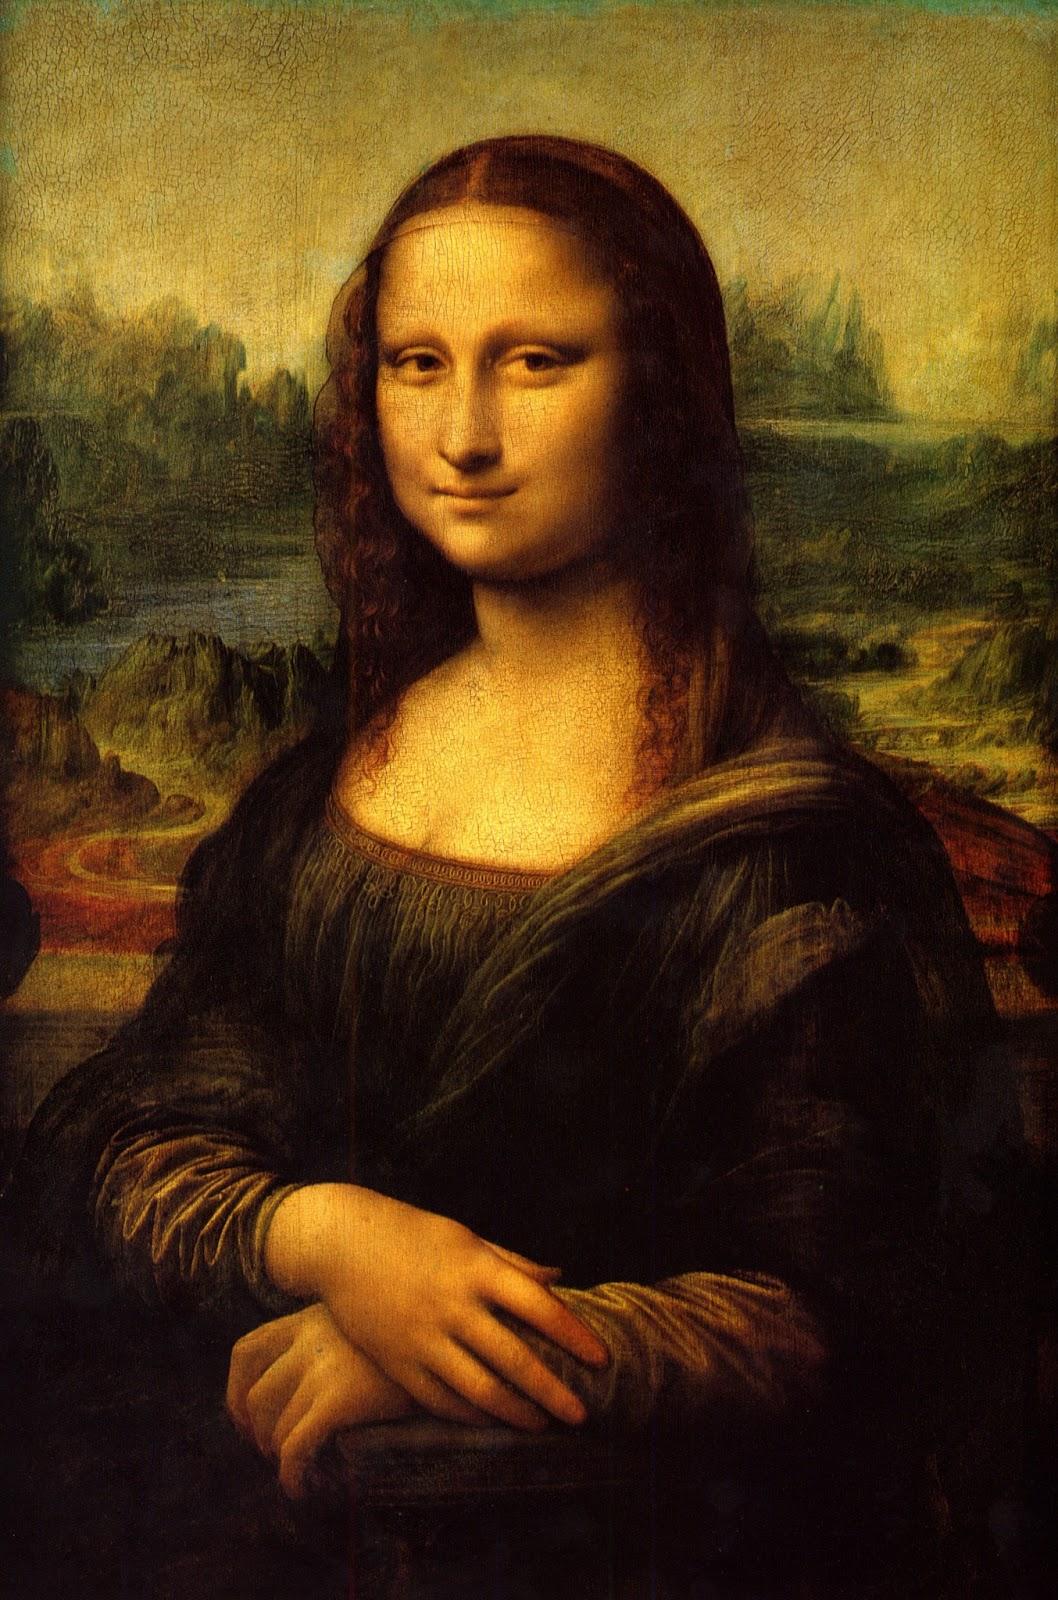 ikdrawingz: Alien auf Mona Lisa?